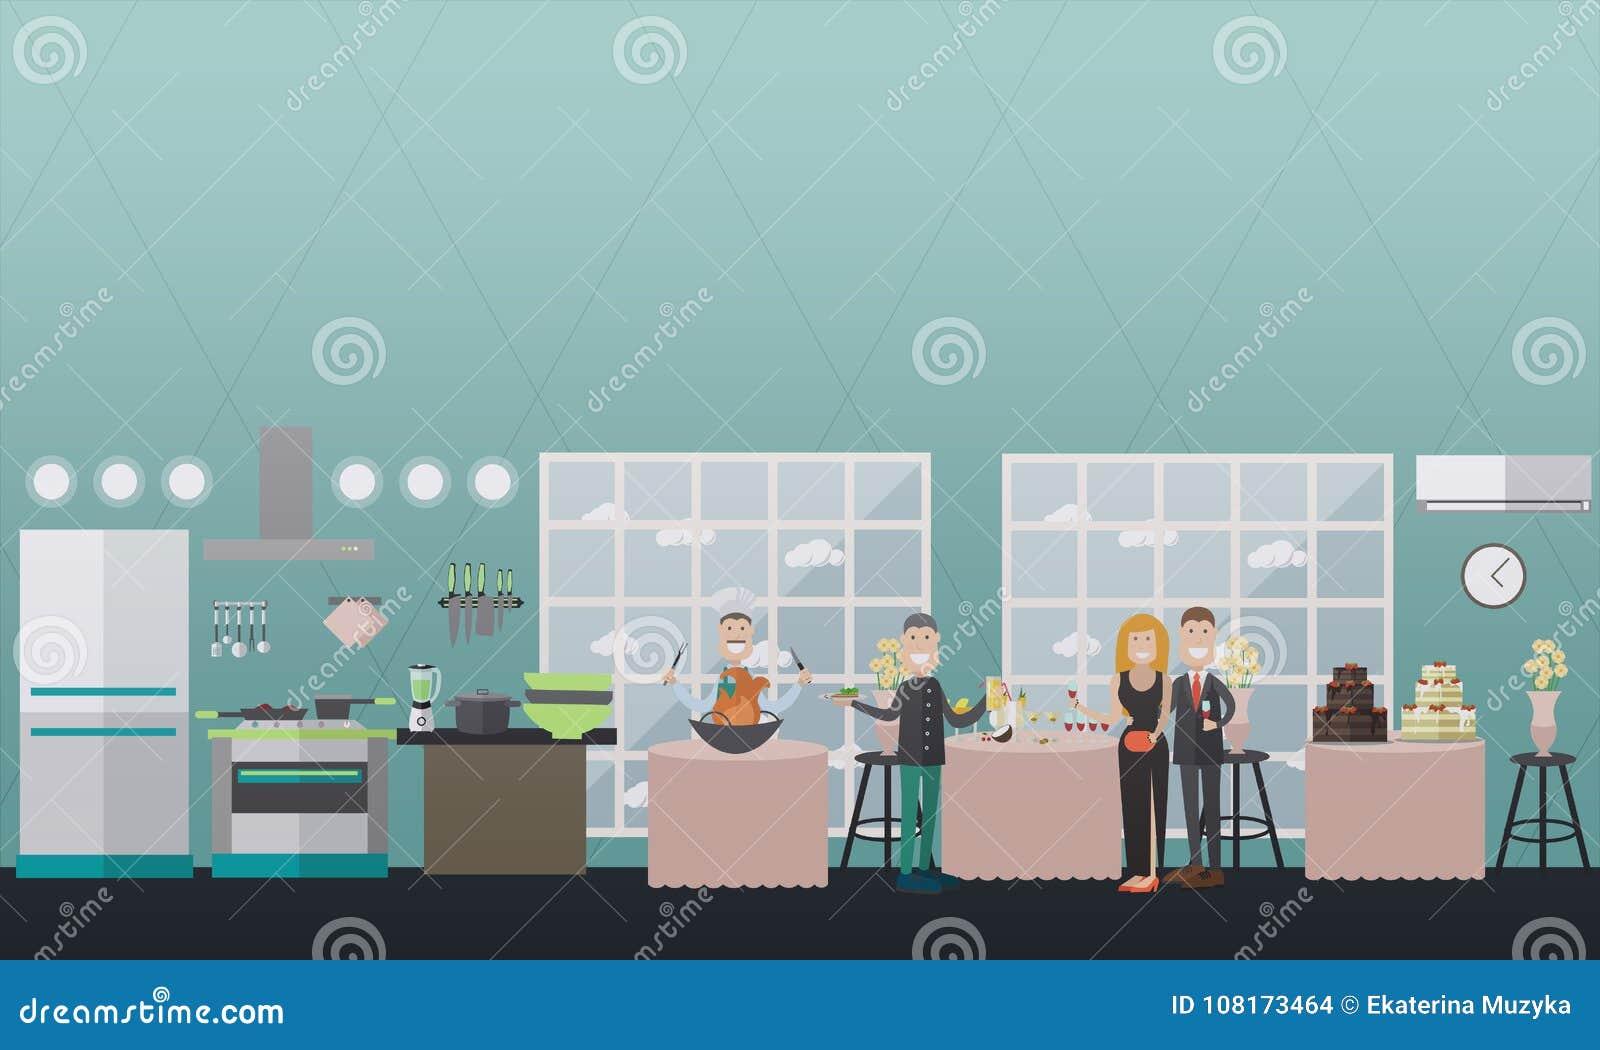 Buffet Style Dinner At Restaurant Vector Flat Illustration Stock ...